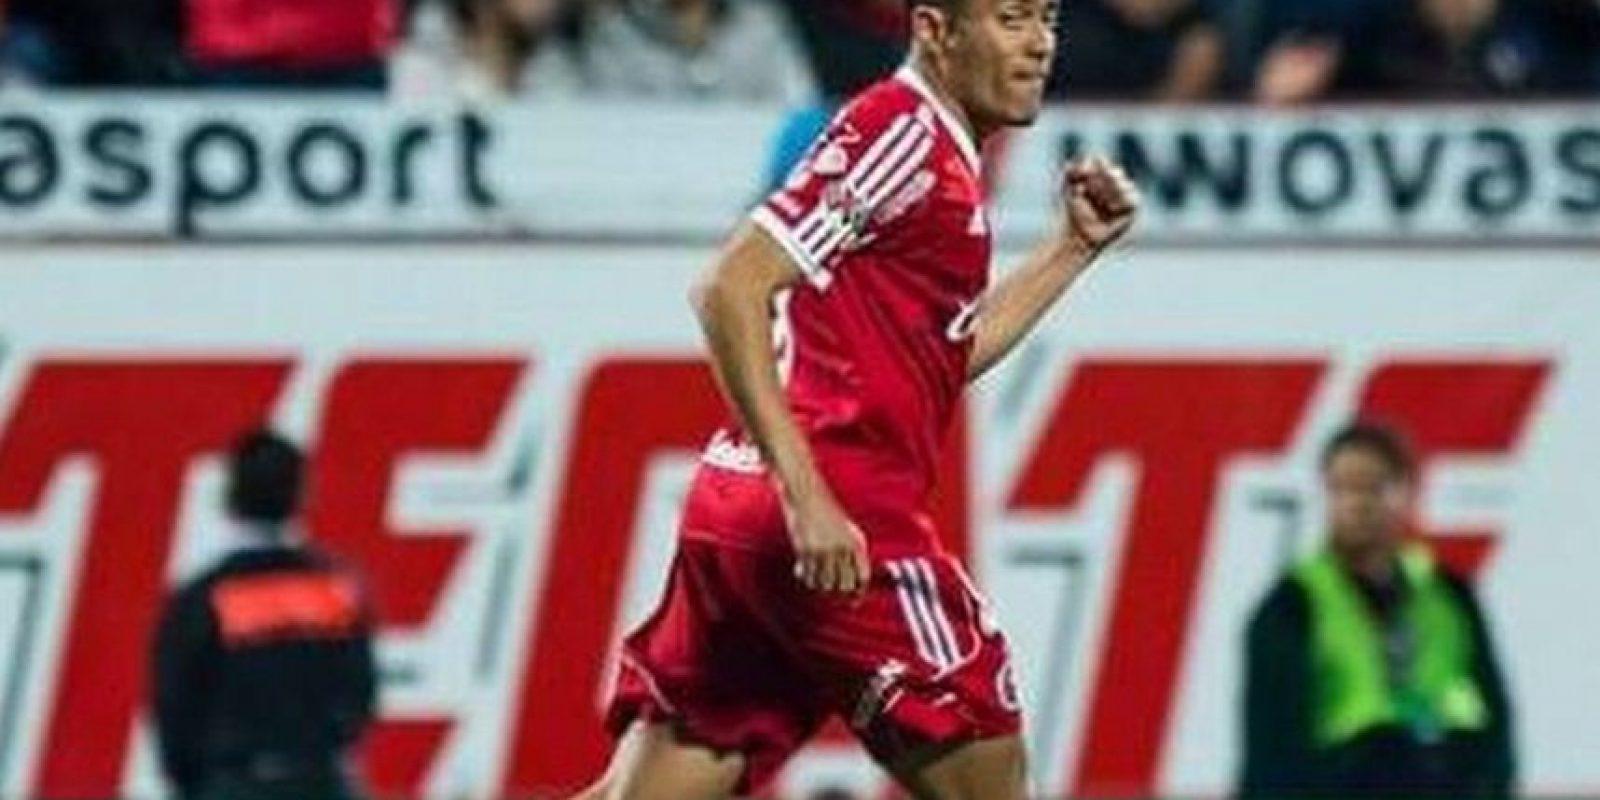 El venezolano Juan Arango agredió a Jesús Zavala, en partido de la Liga MX de México Foto:Vía instagram.com/juan18arango